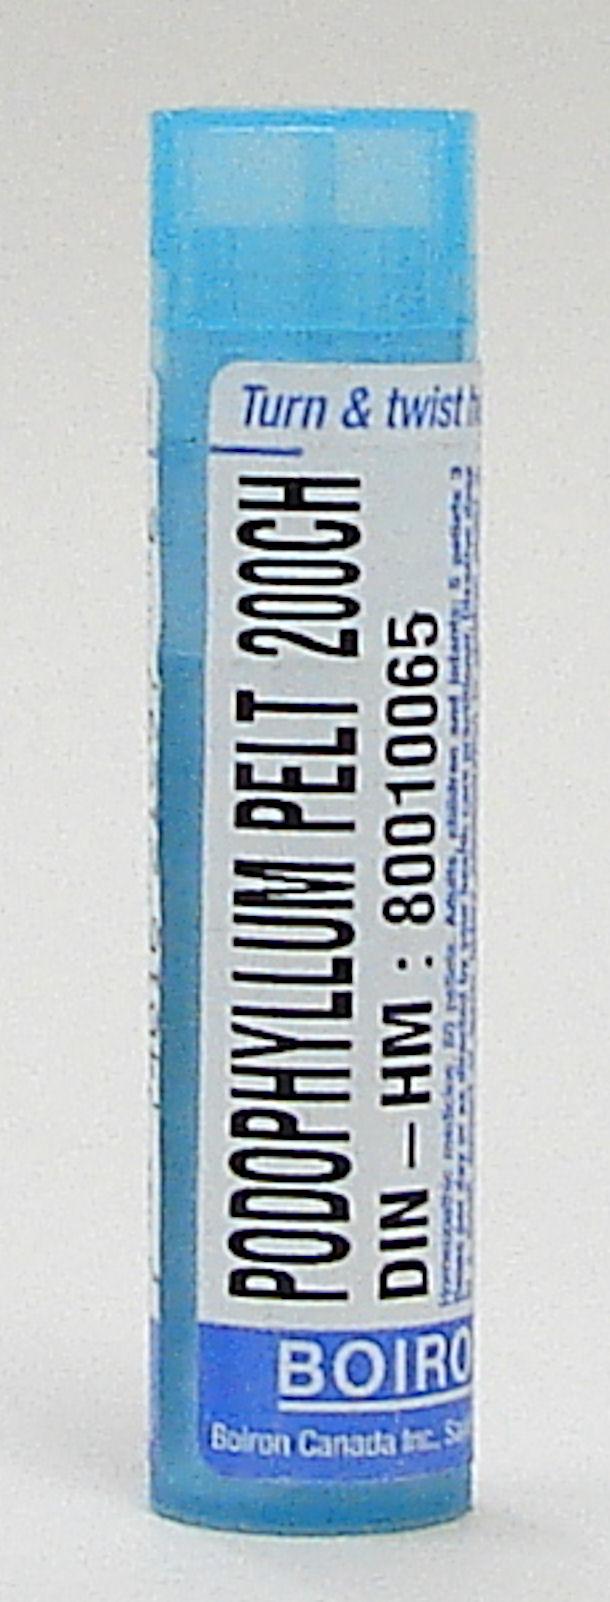 Podophyllum Peltatum 200ch sublingual pellets (Boiron)